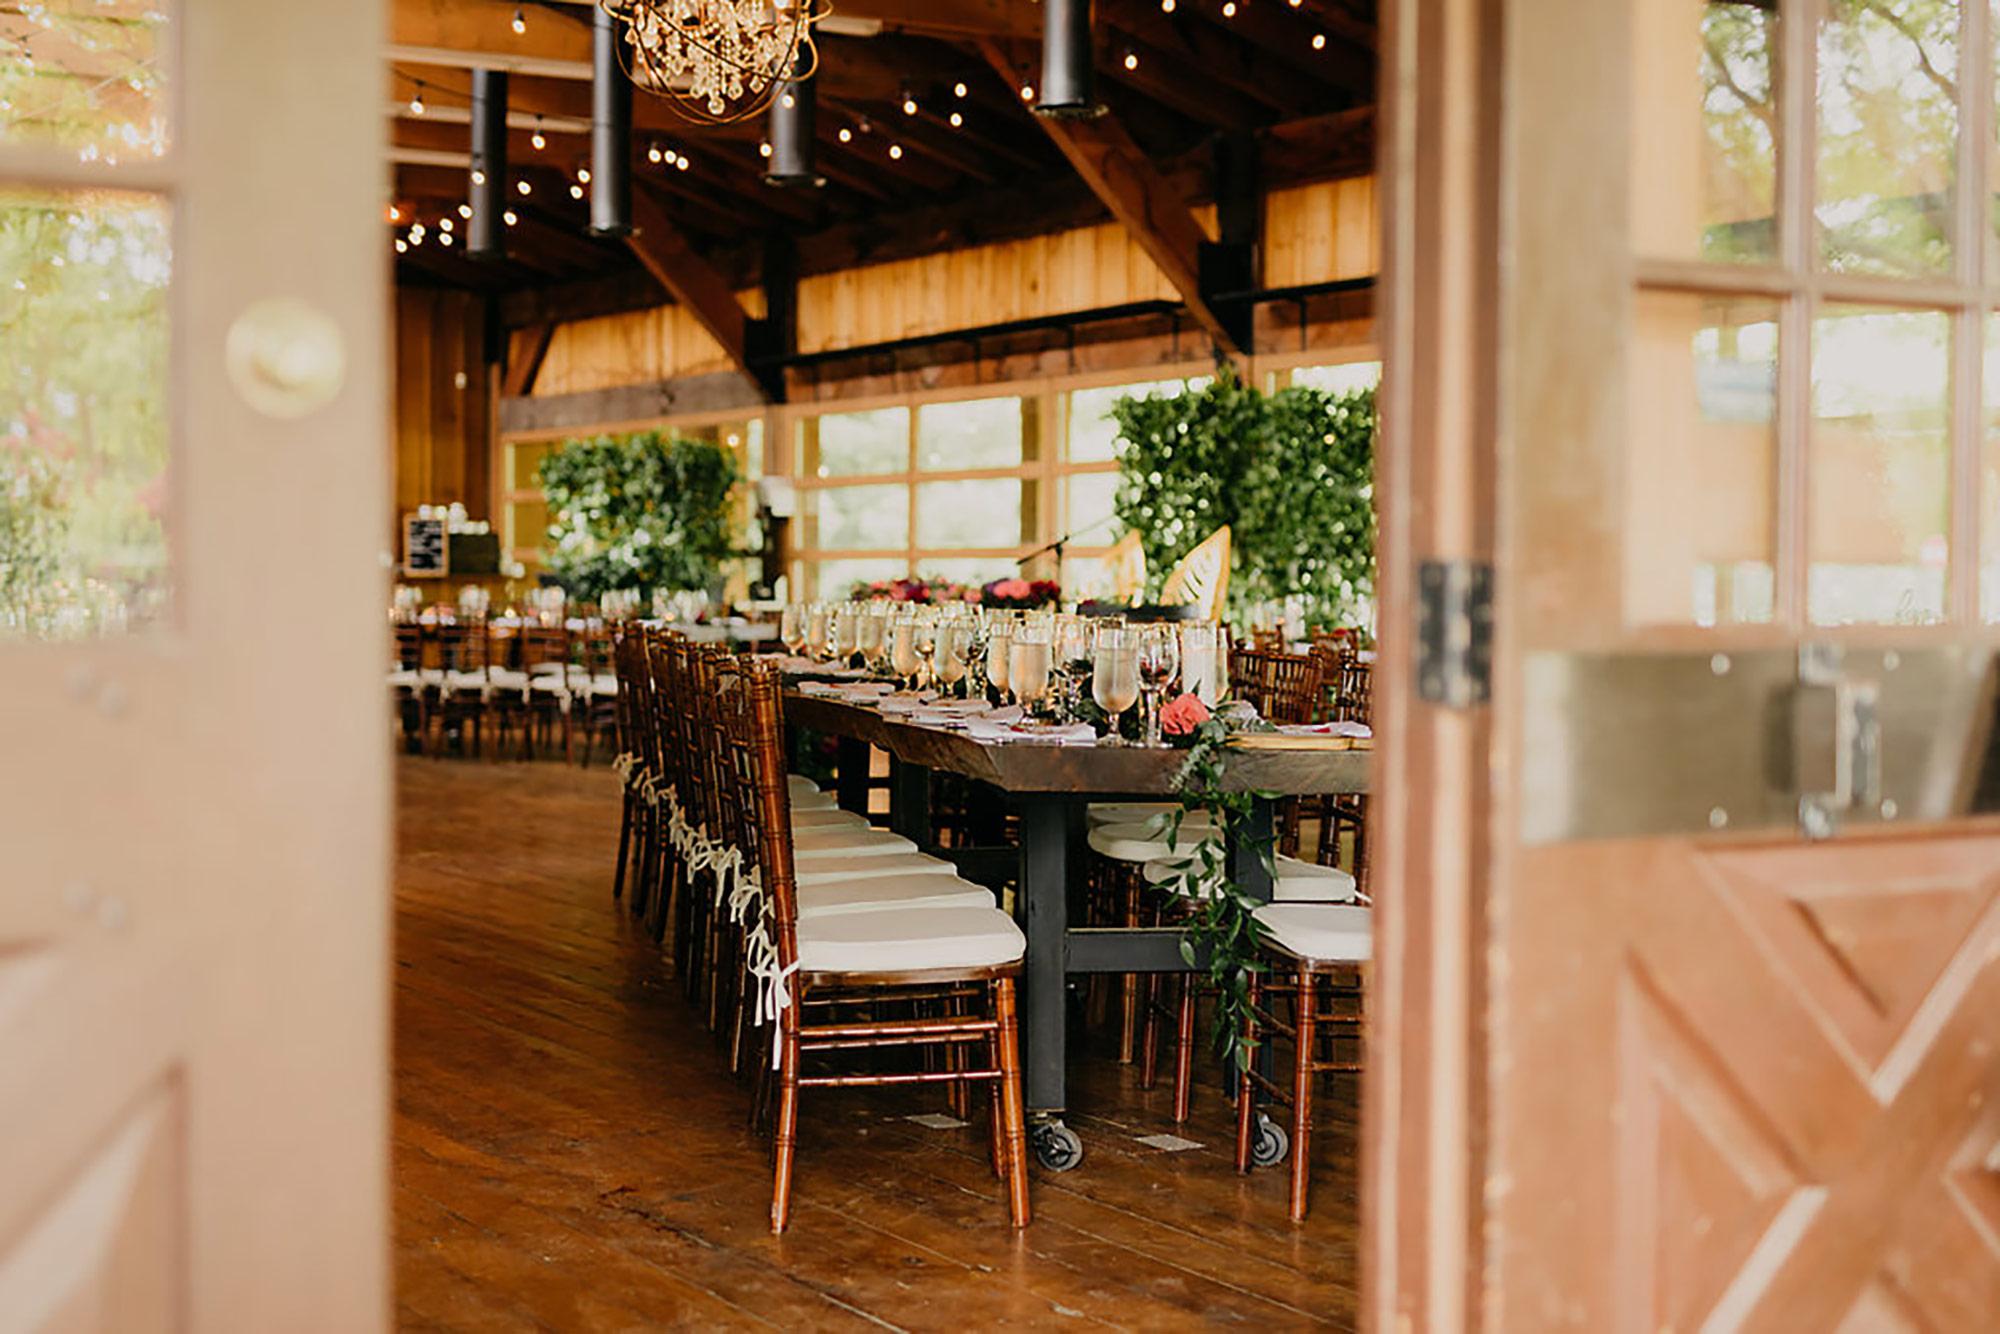 Kurtz-Orchards-Wedding-Niagara-wedding-Vineyard-Bride-Photography-by-Kayla-Rocca-046.JPG